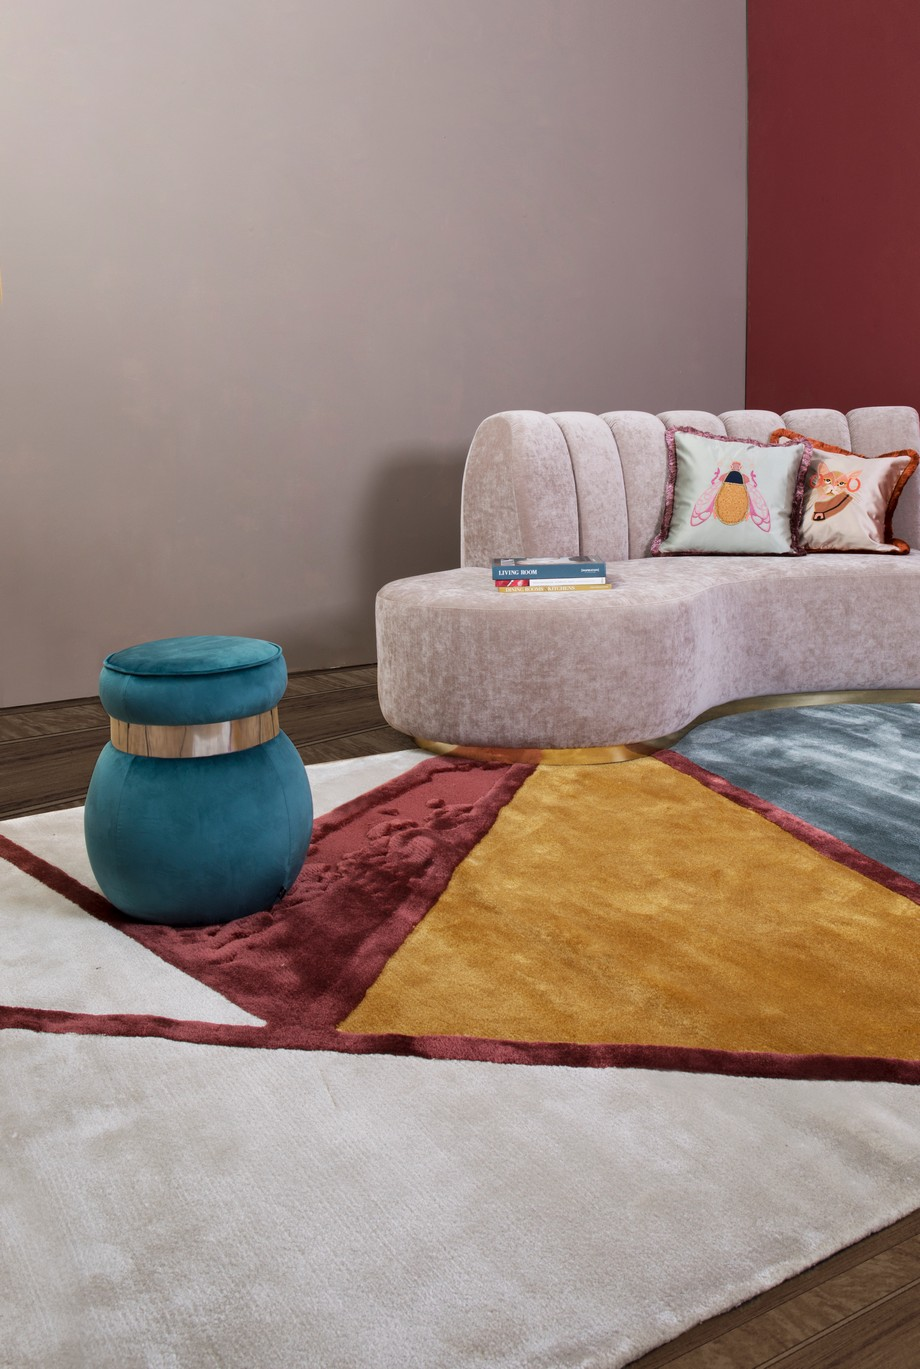 Sofas de lujo: Ideas de sala de estar para proyectos lujuosos sofas de lujo Sofas de lujo: Ideas de sala de estar para proyectos lujuosos ambience 191 HR